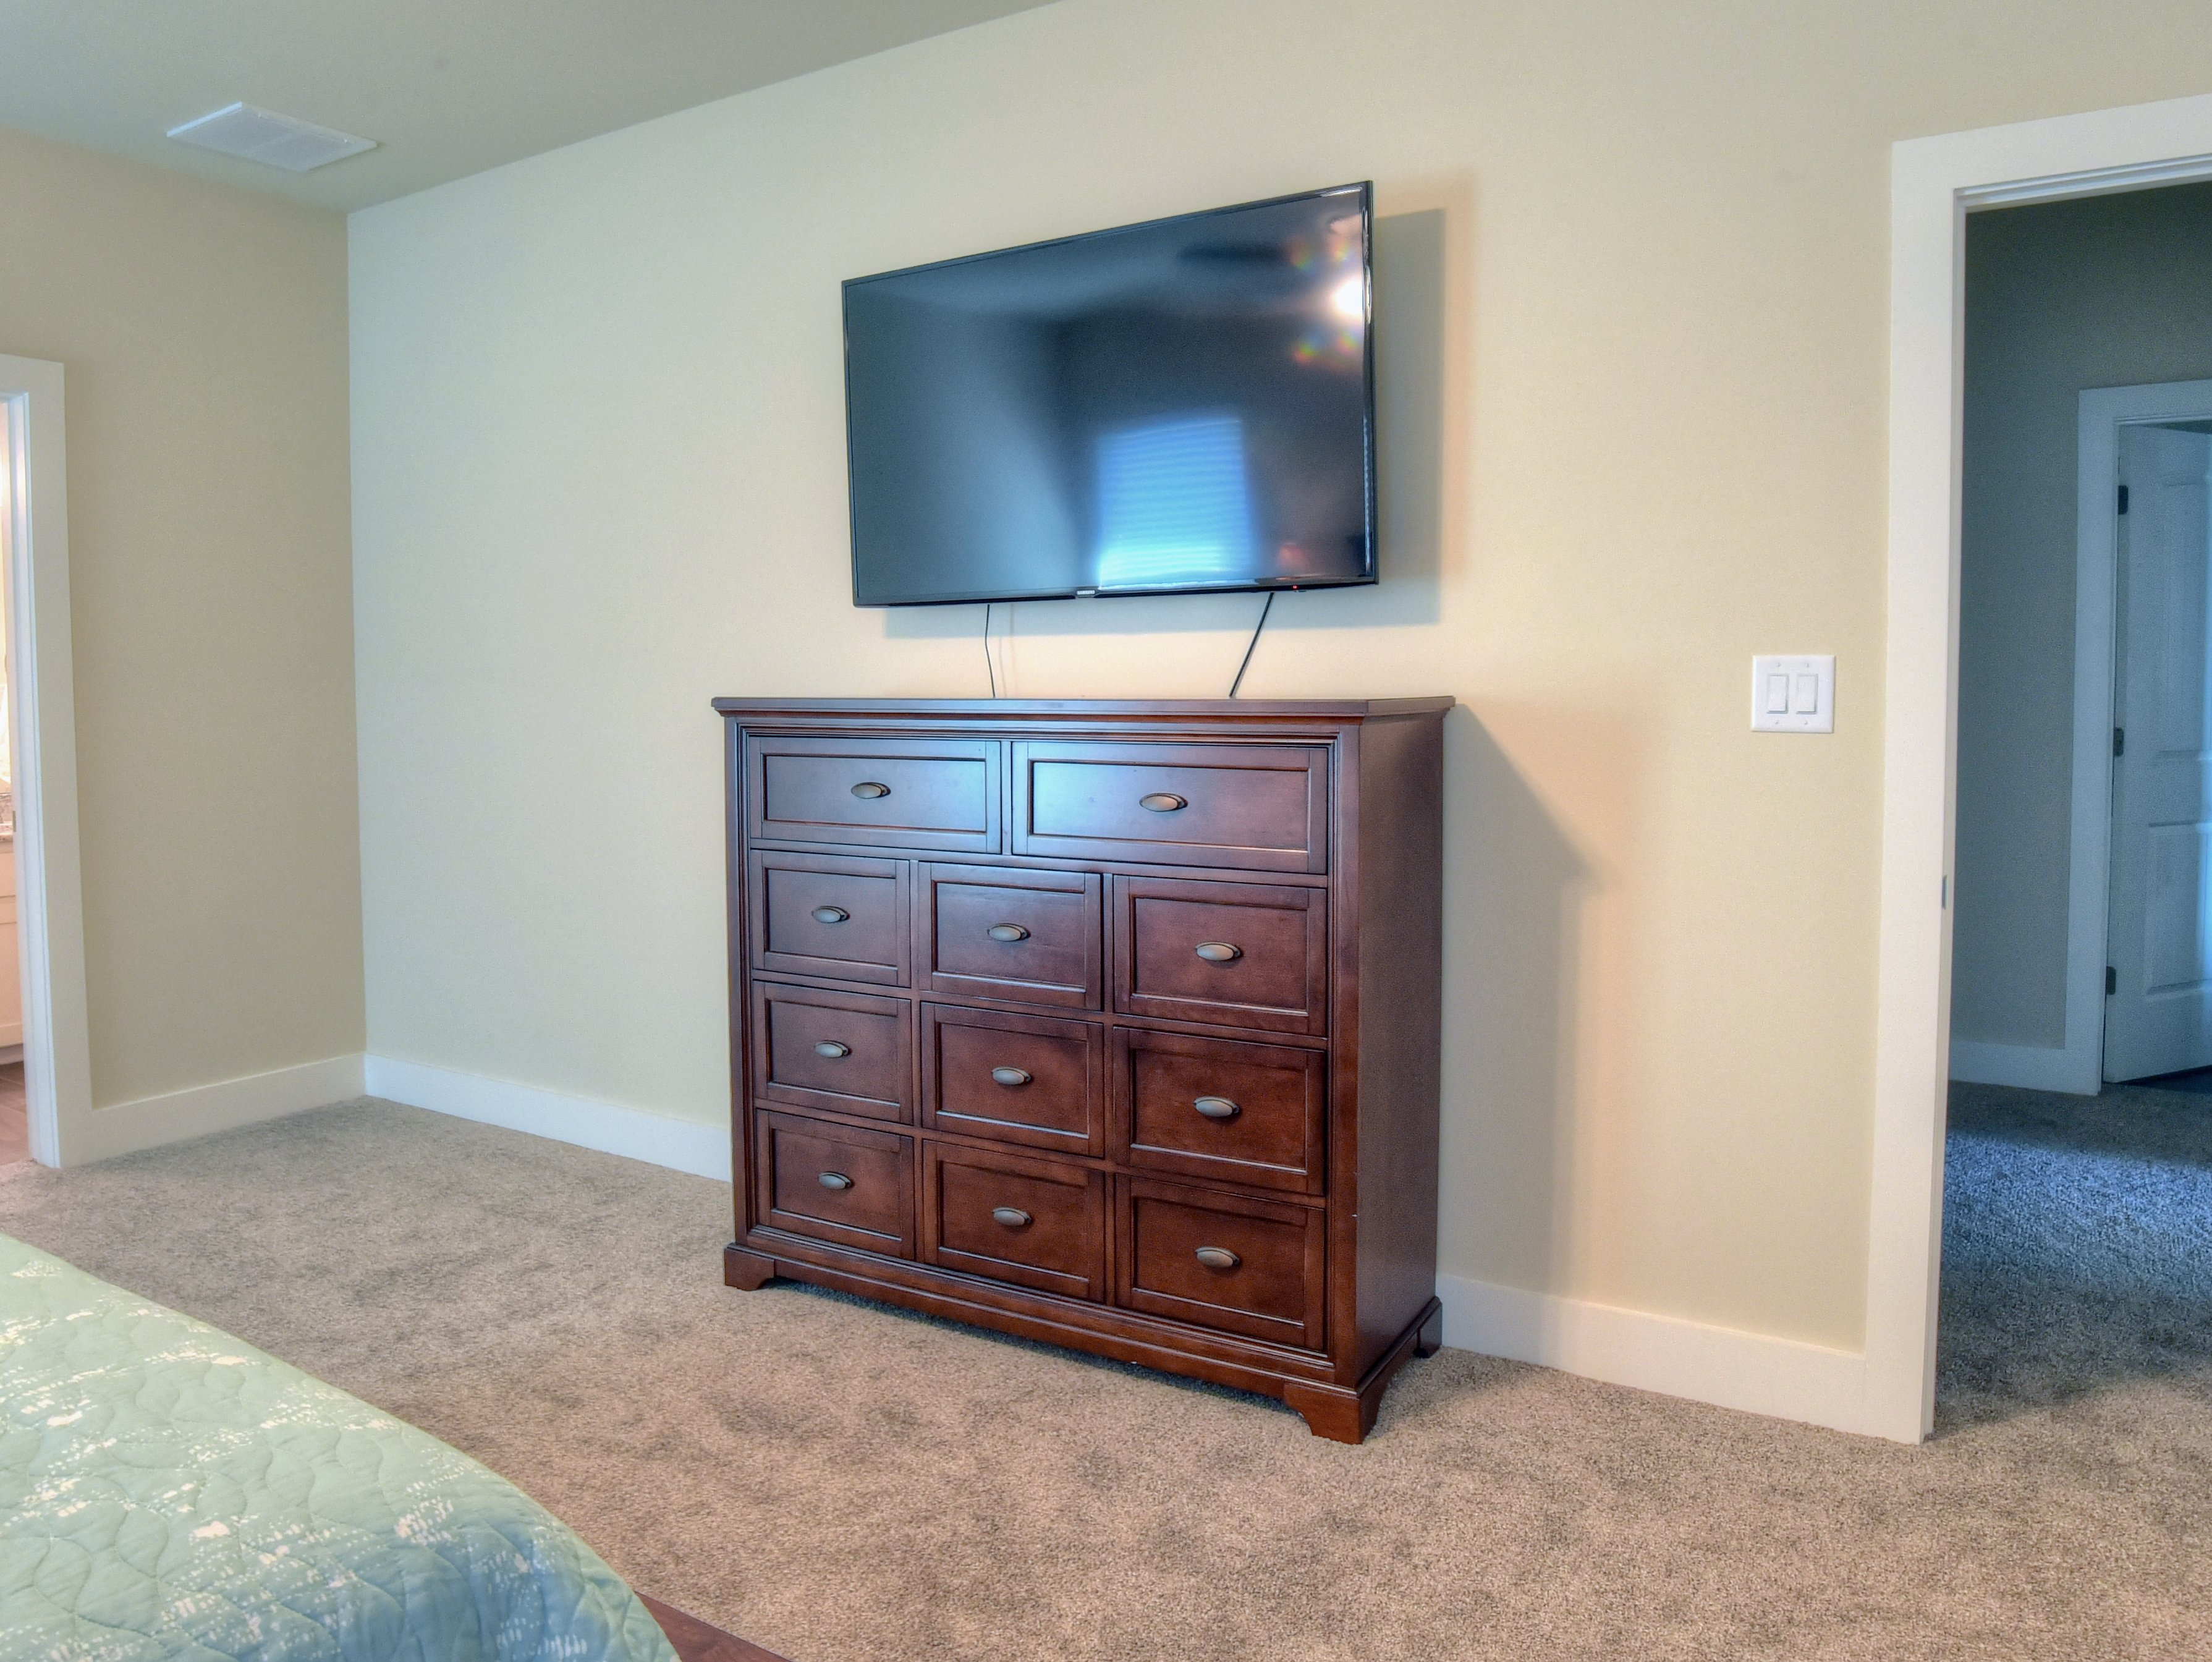 93 Beacon Point Condo rental in Sandestin Rentals ~ Cottages and Villas  in Destin Florida - #21